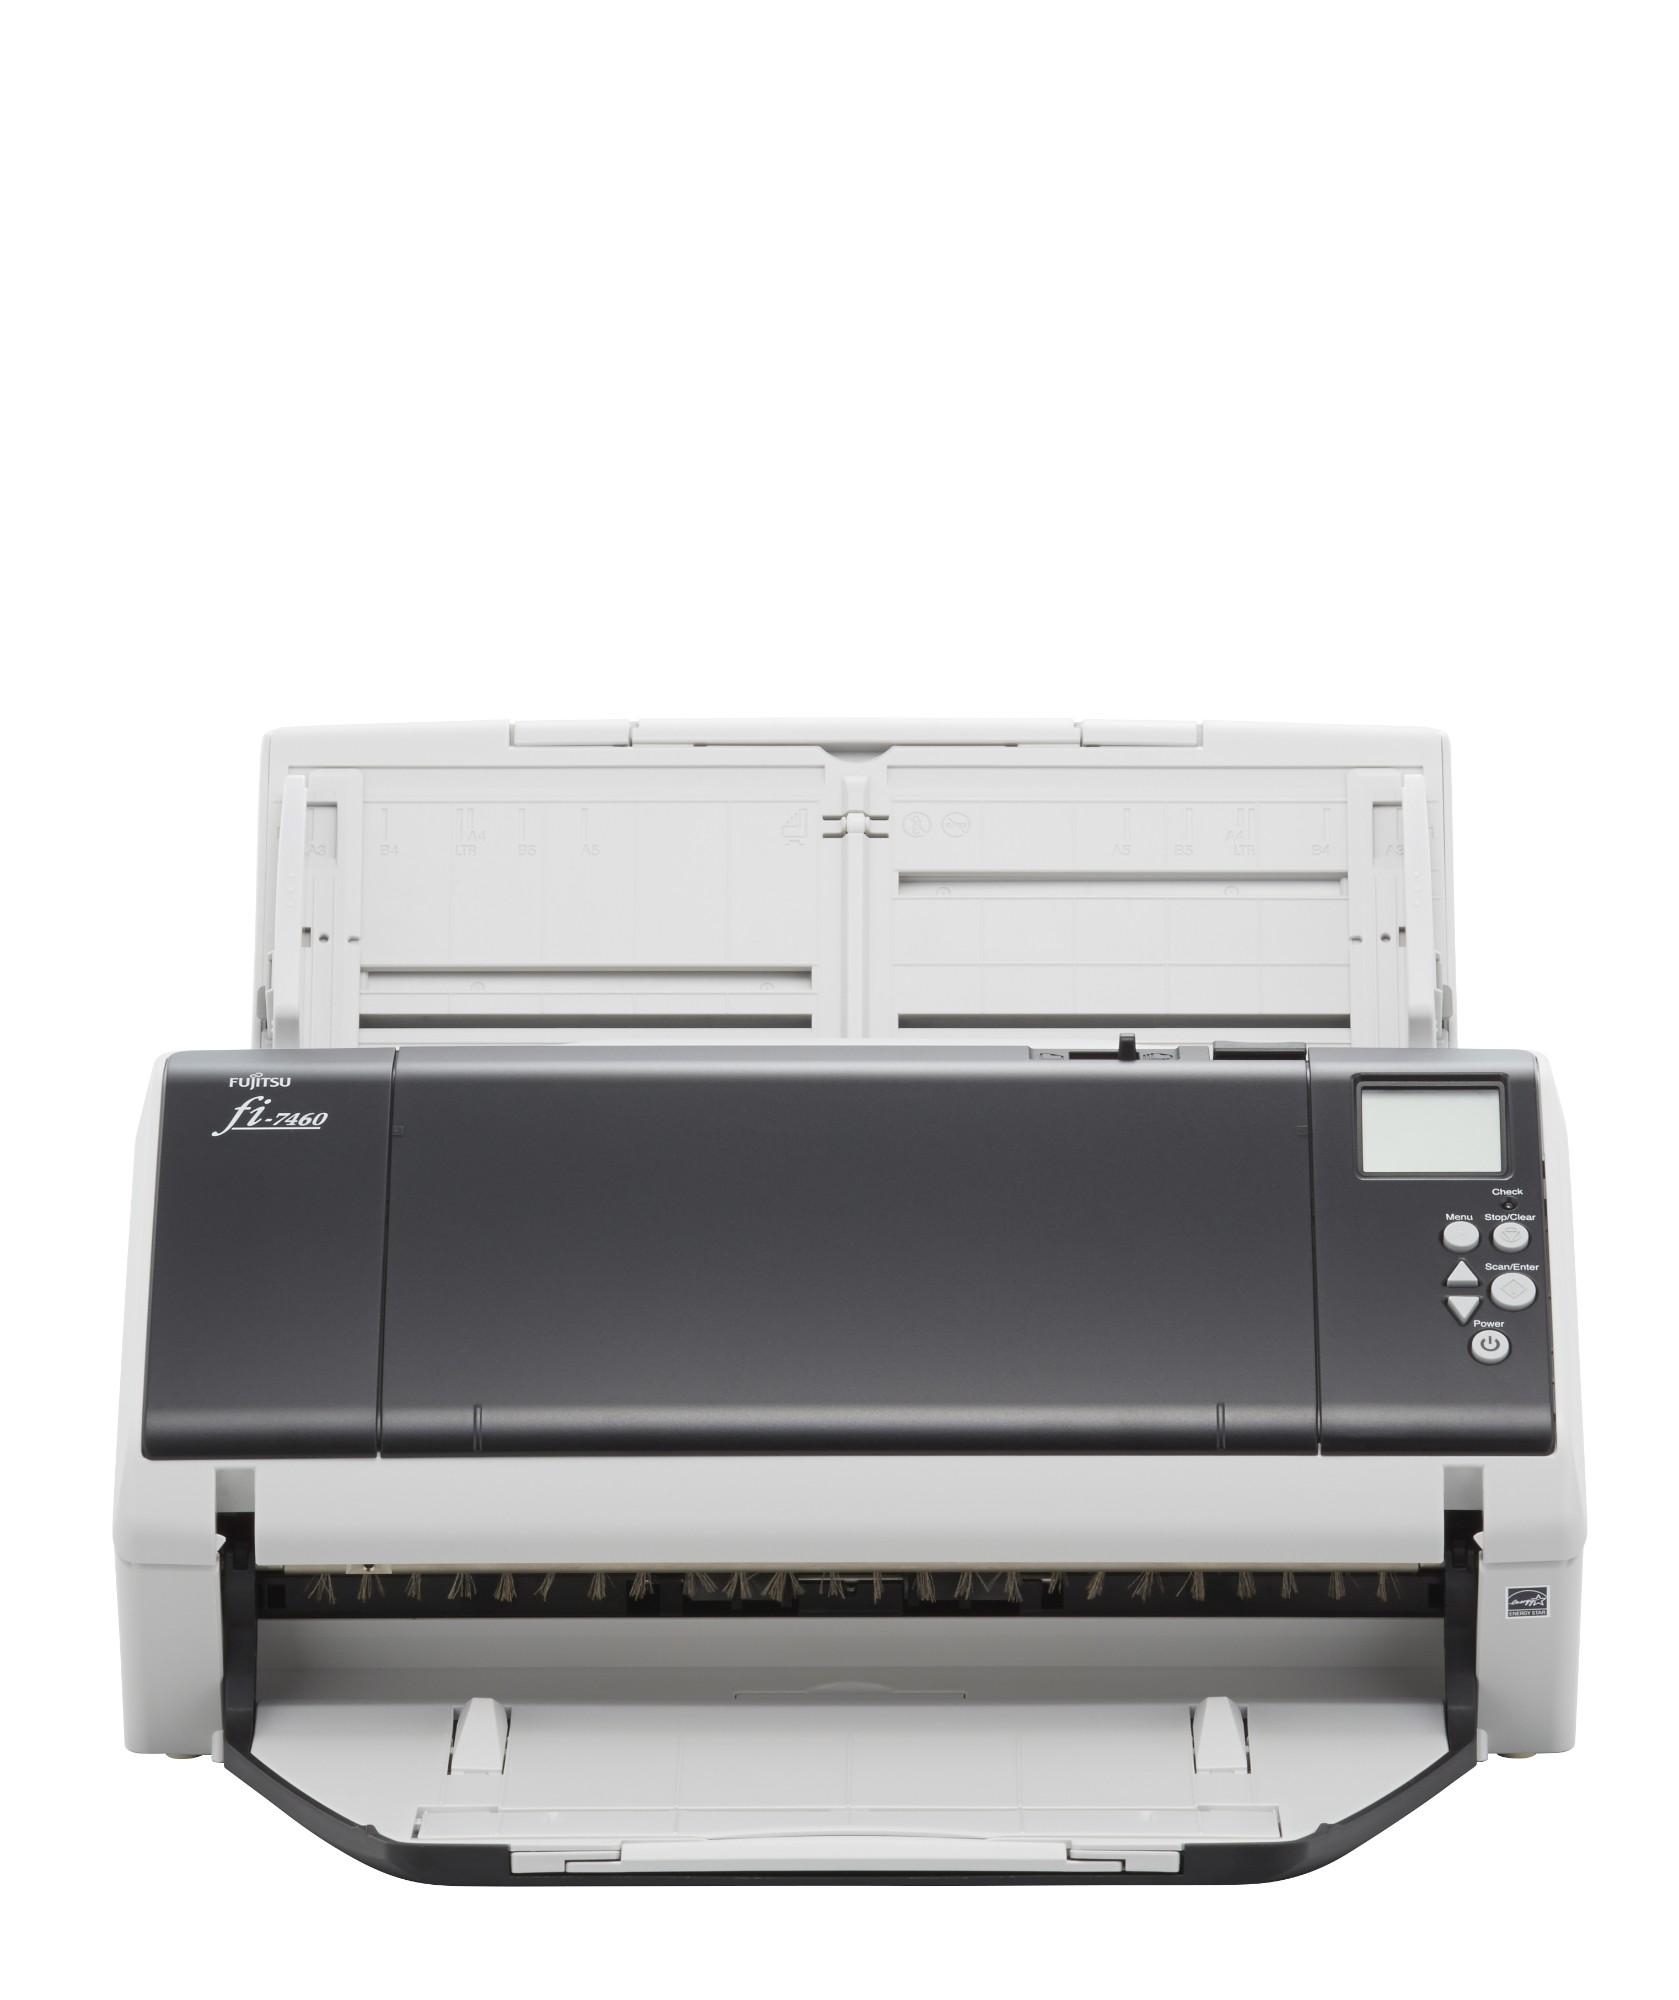 Fujitsu fi-7460 ADF + Manual feed scanner 600 x 600 DPI A3 Grey, White